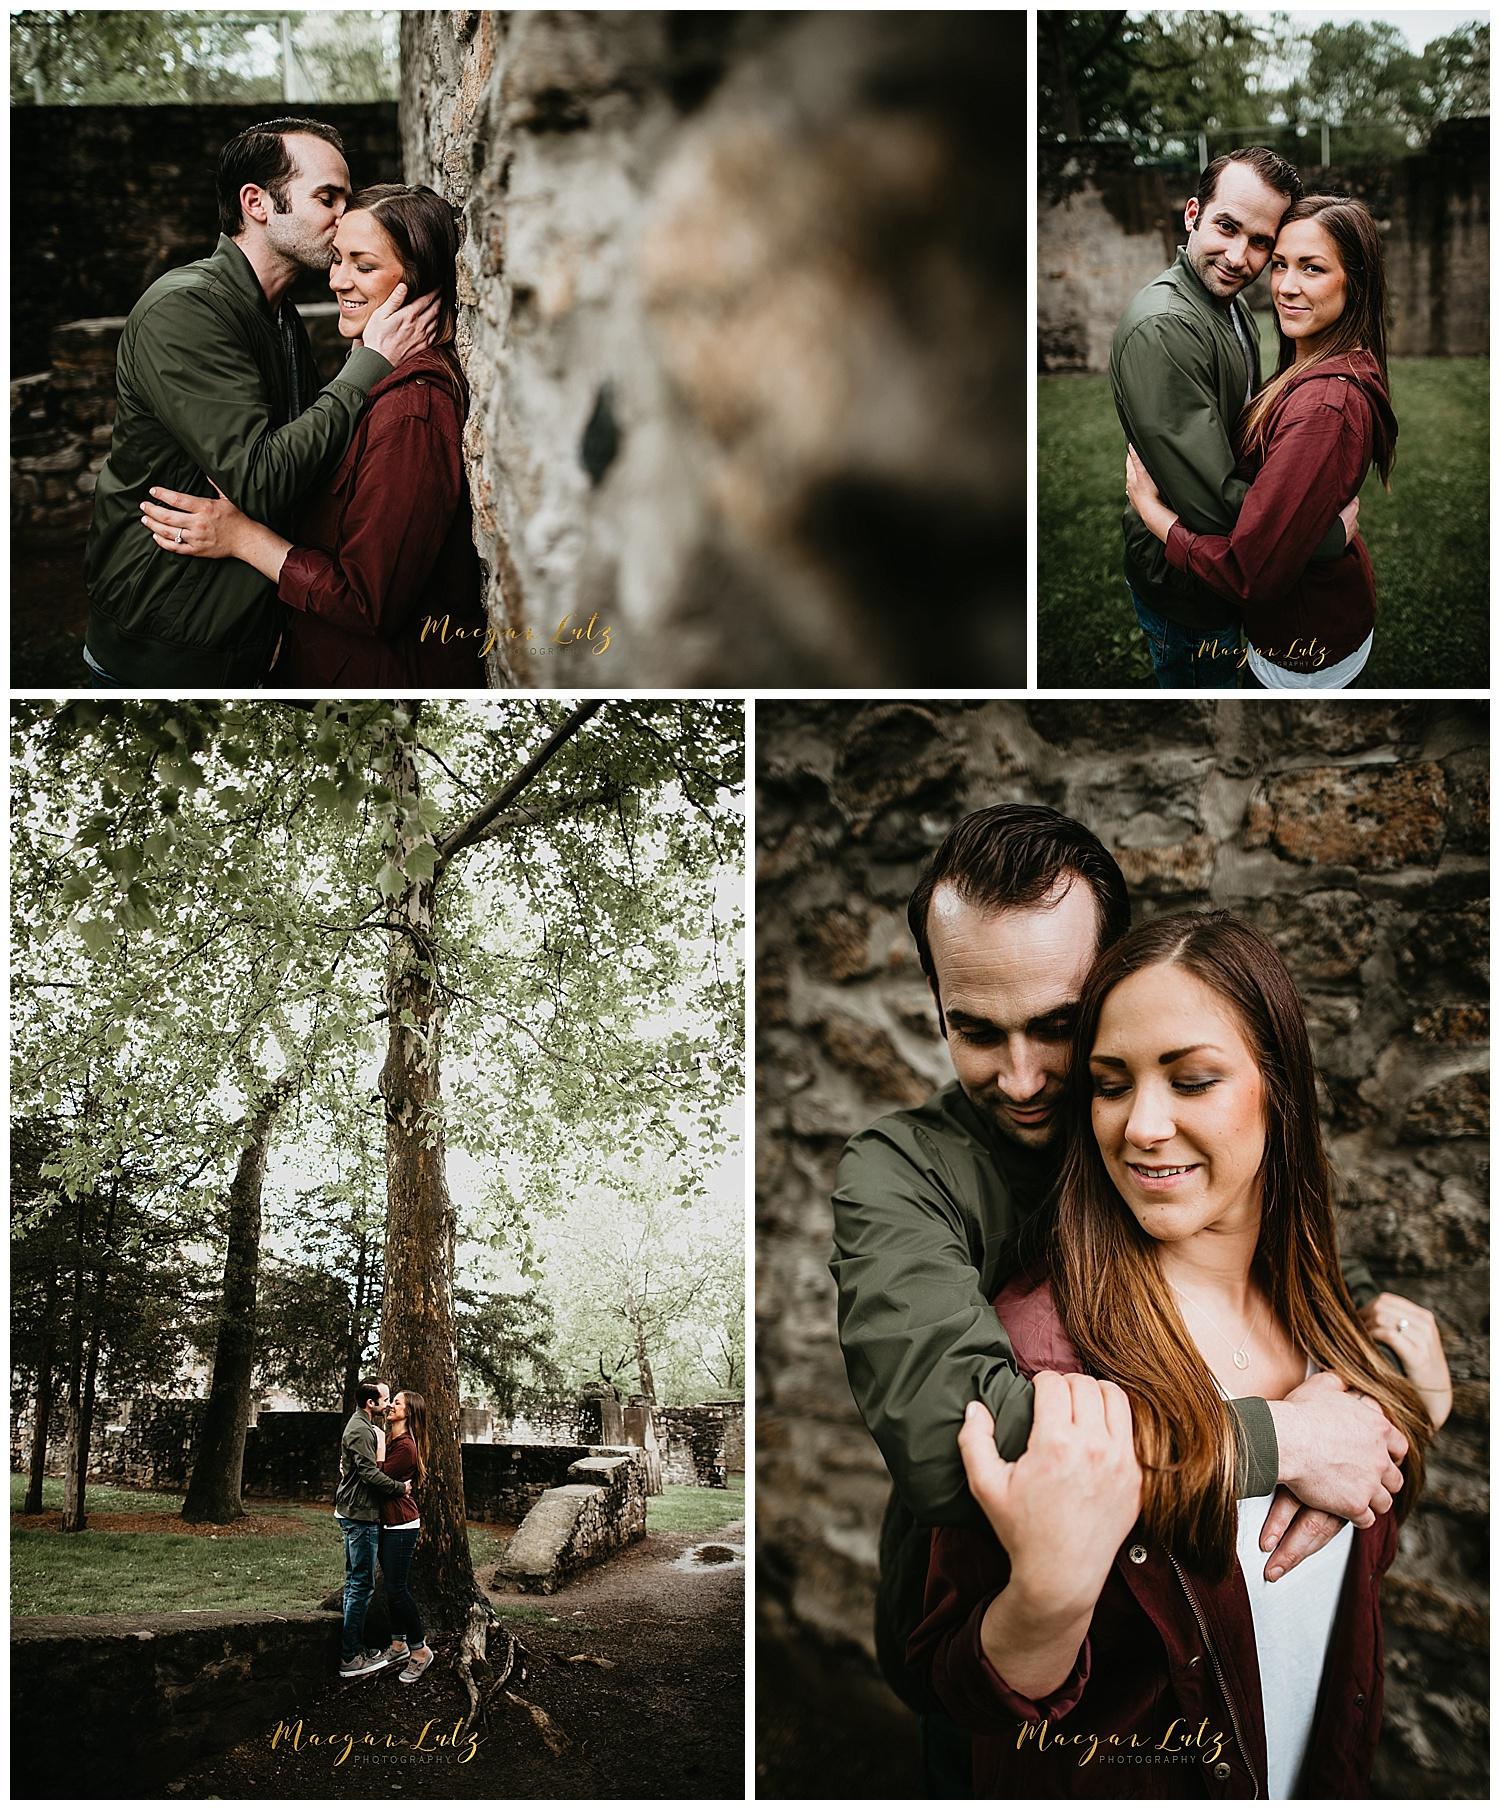 NEPA-wedding-engagement-photographer-Lockridge-park-Alburtis-PA_0033.jpg